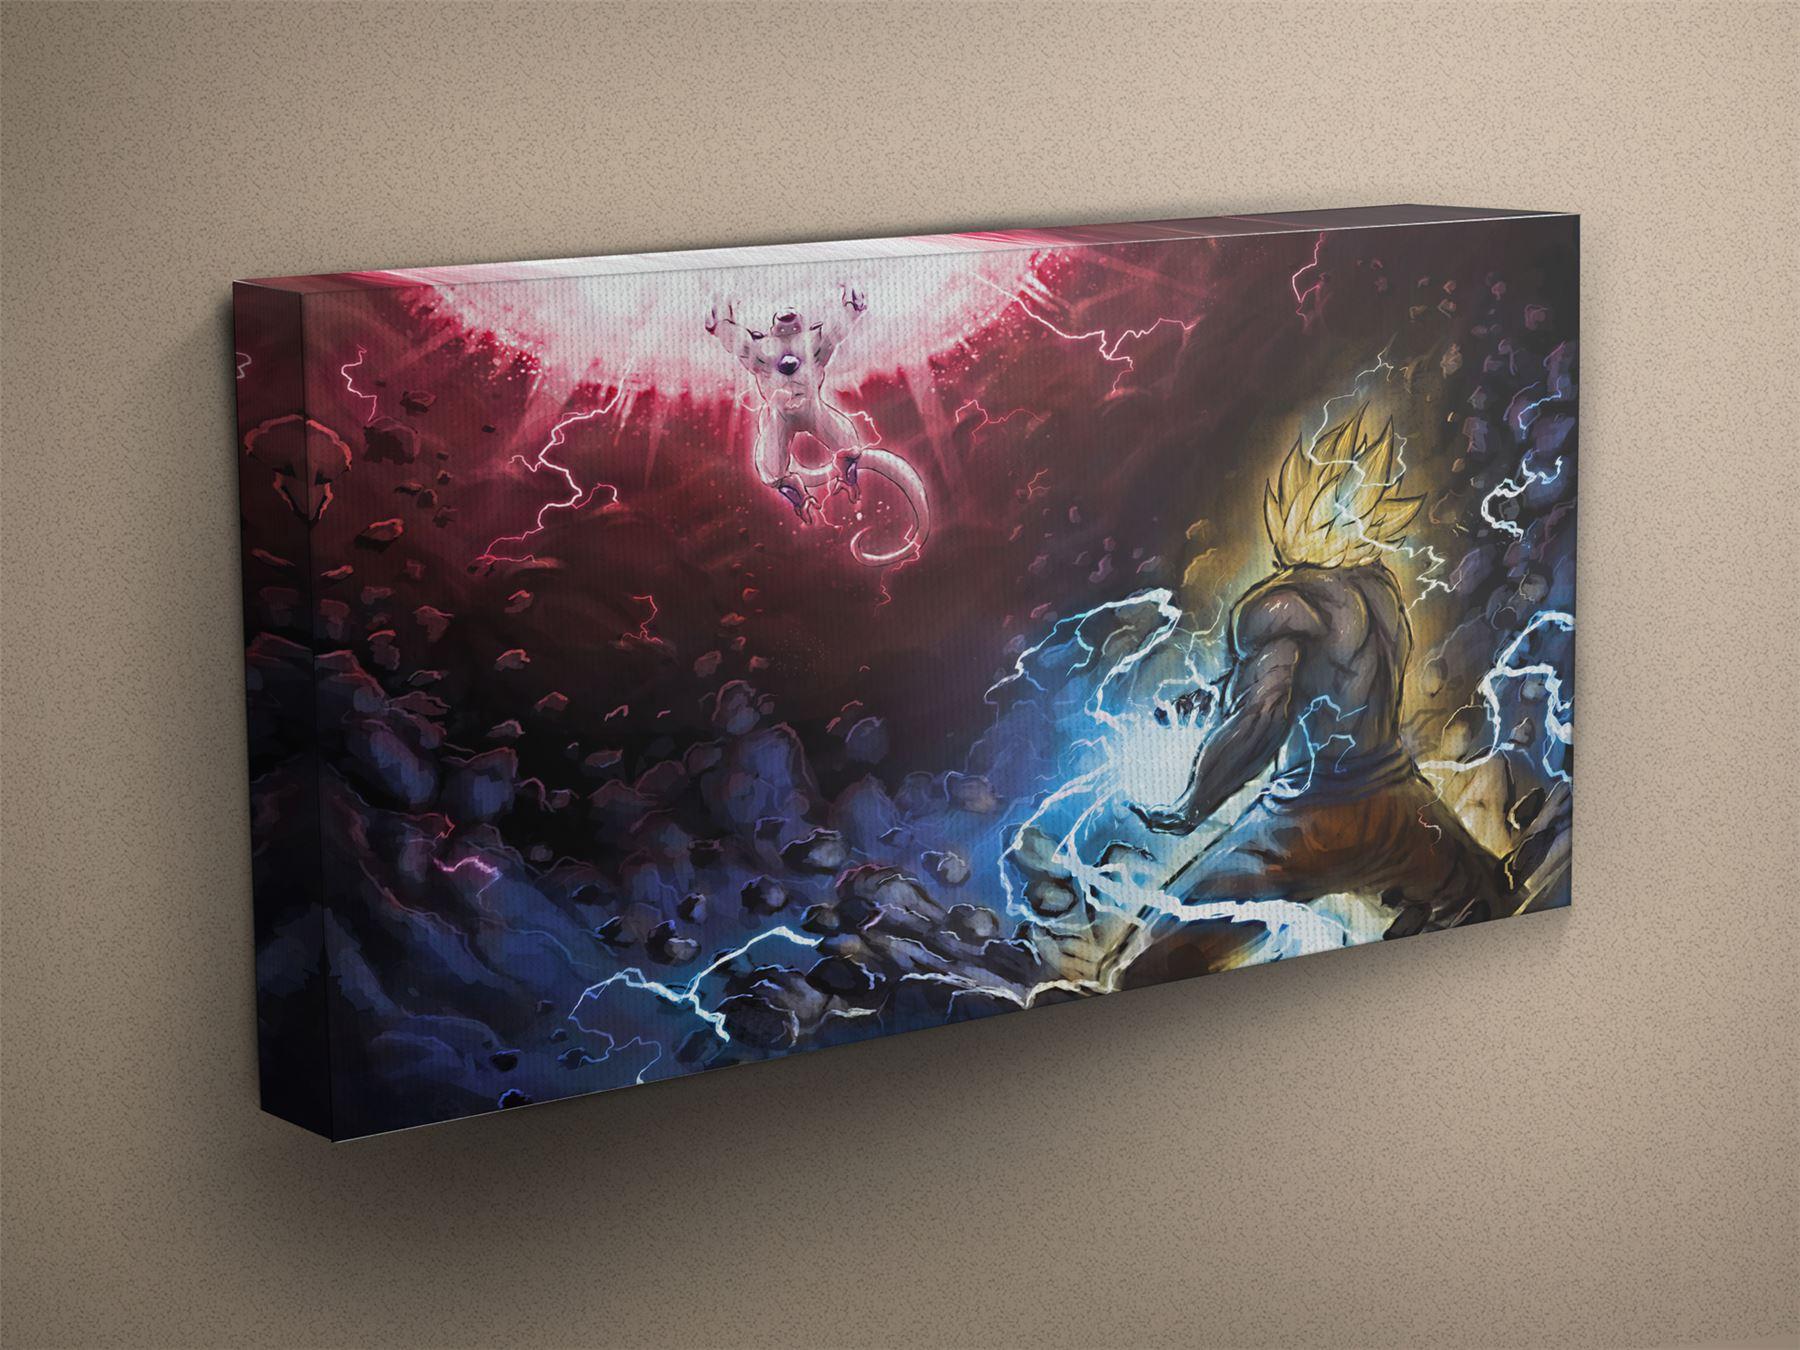 Details about dragon ball z frieza vs goku canvas art print 001860